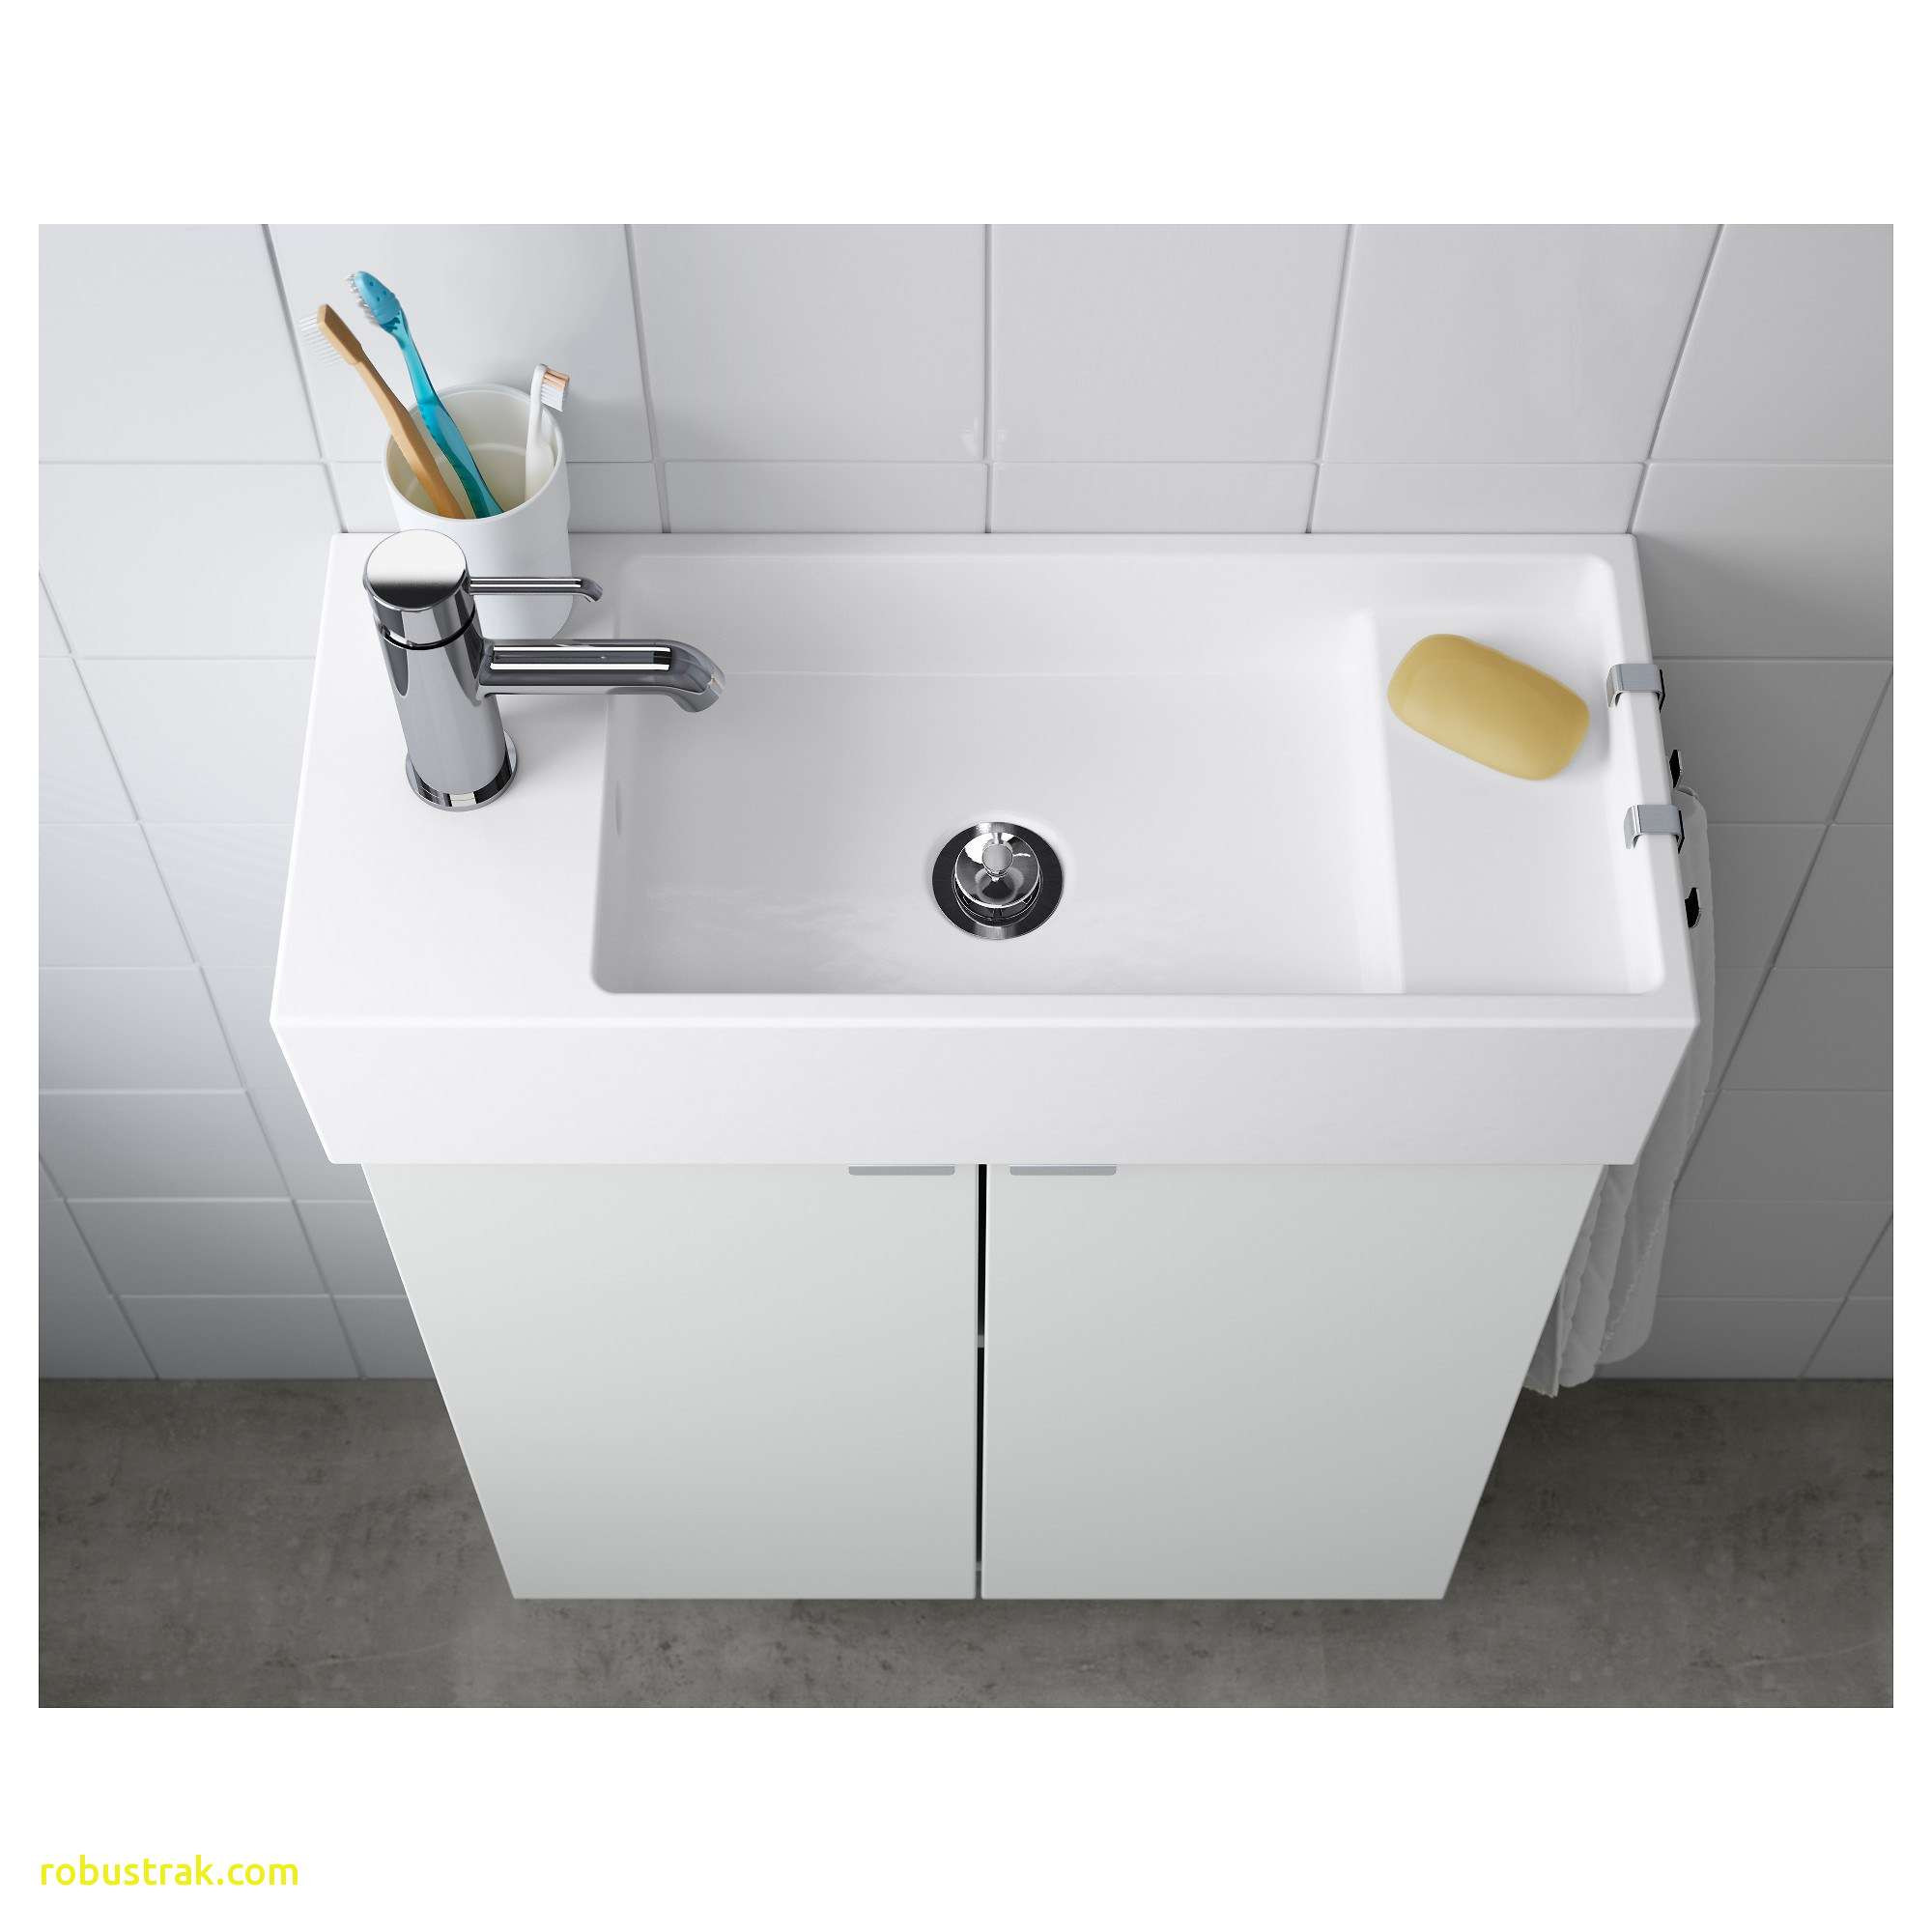 30 Lovely Ikea Rectangle Vase 2021 free download ikea rectangle vase of beautiful ikea bathroom sinks home design ideas in pe s5h sink ikea small i 0d awesome ikea bathroom